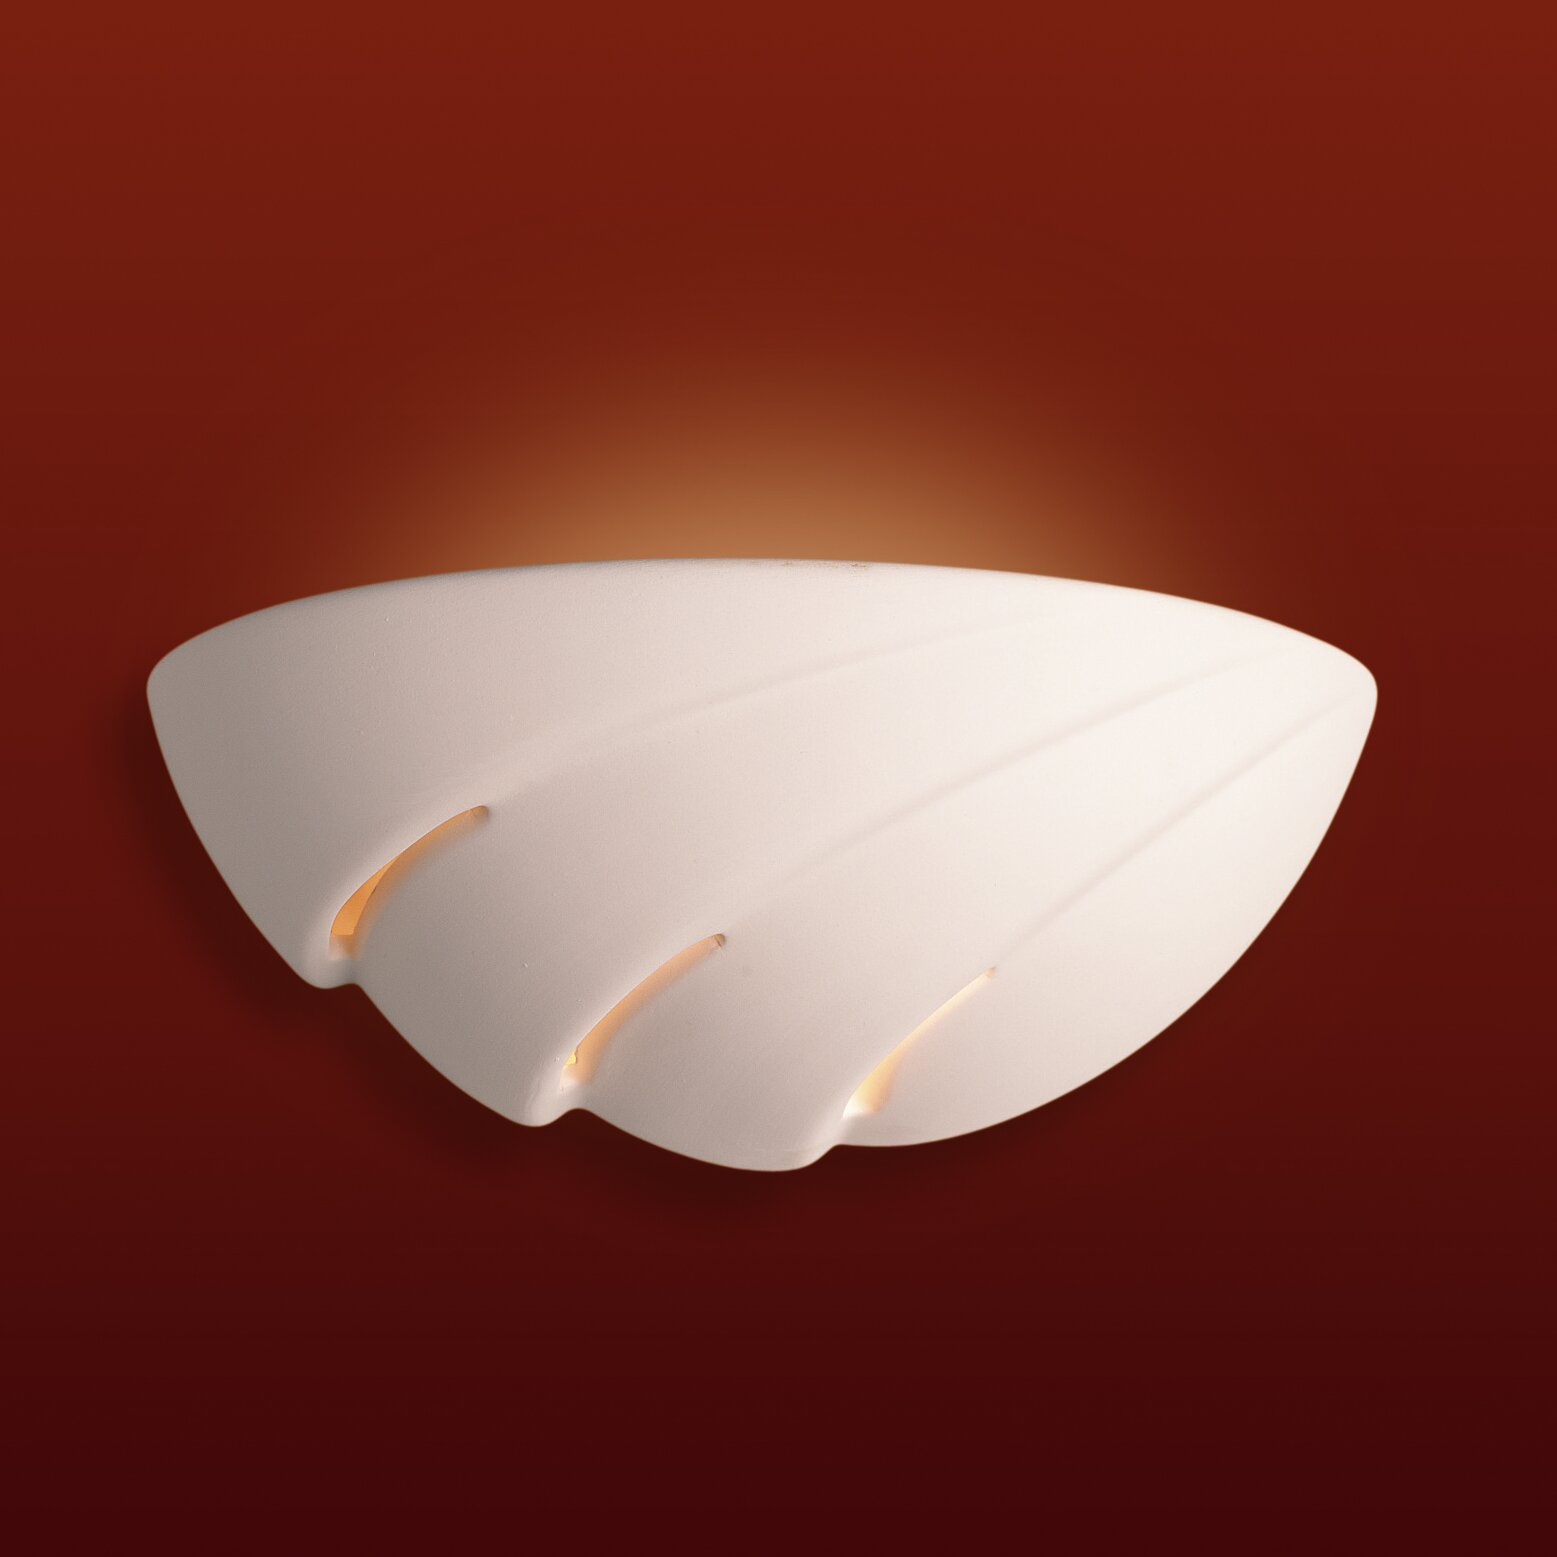 Wall Wash Lighting Ceramic Tile : Firstlight CERAMIC 1 Light Wall Washer & Reviews Wayfair UK